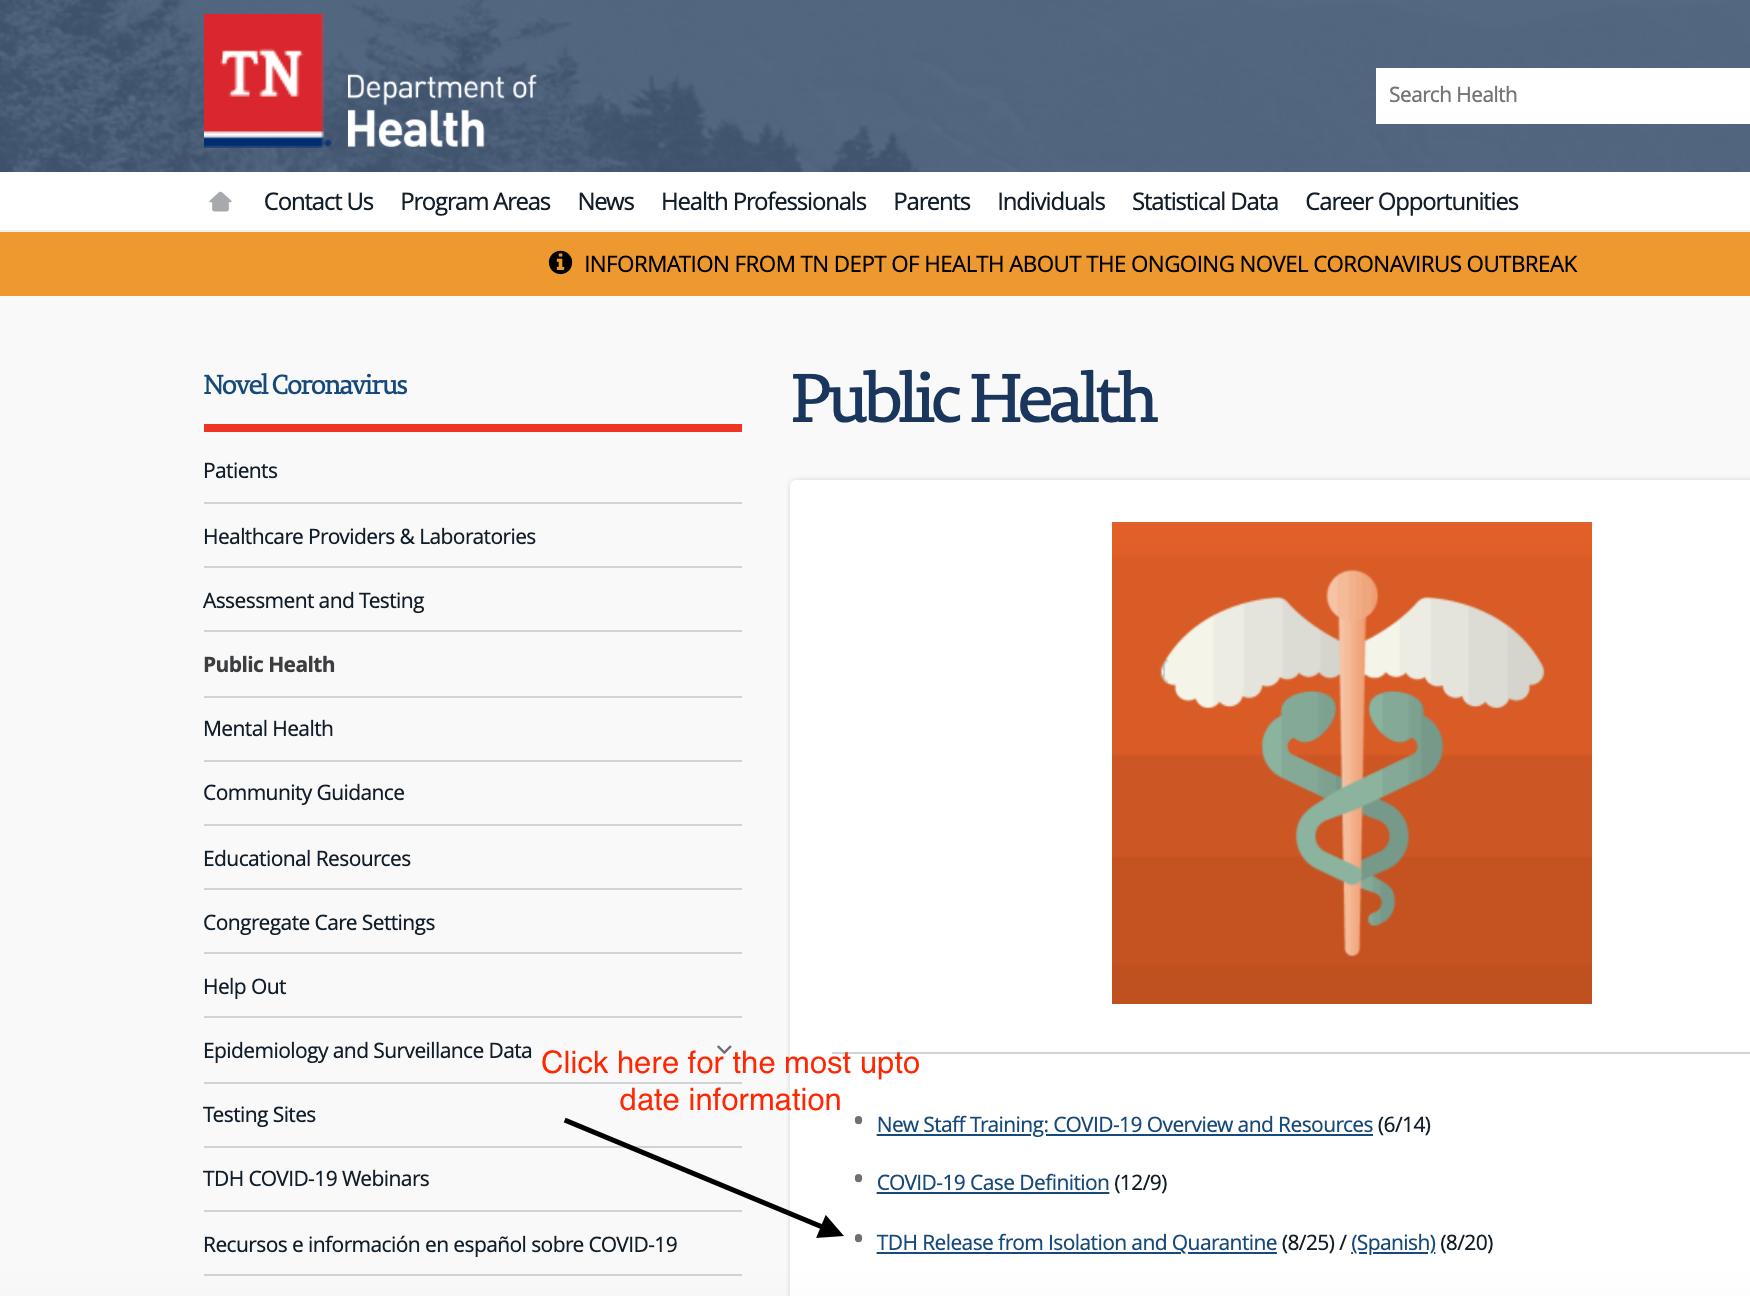 TN Health Department Isolation and Quarantine Cases